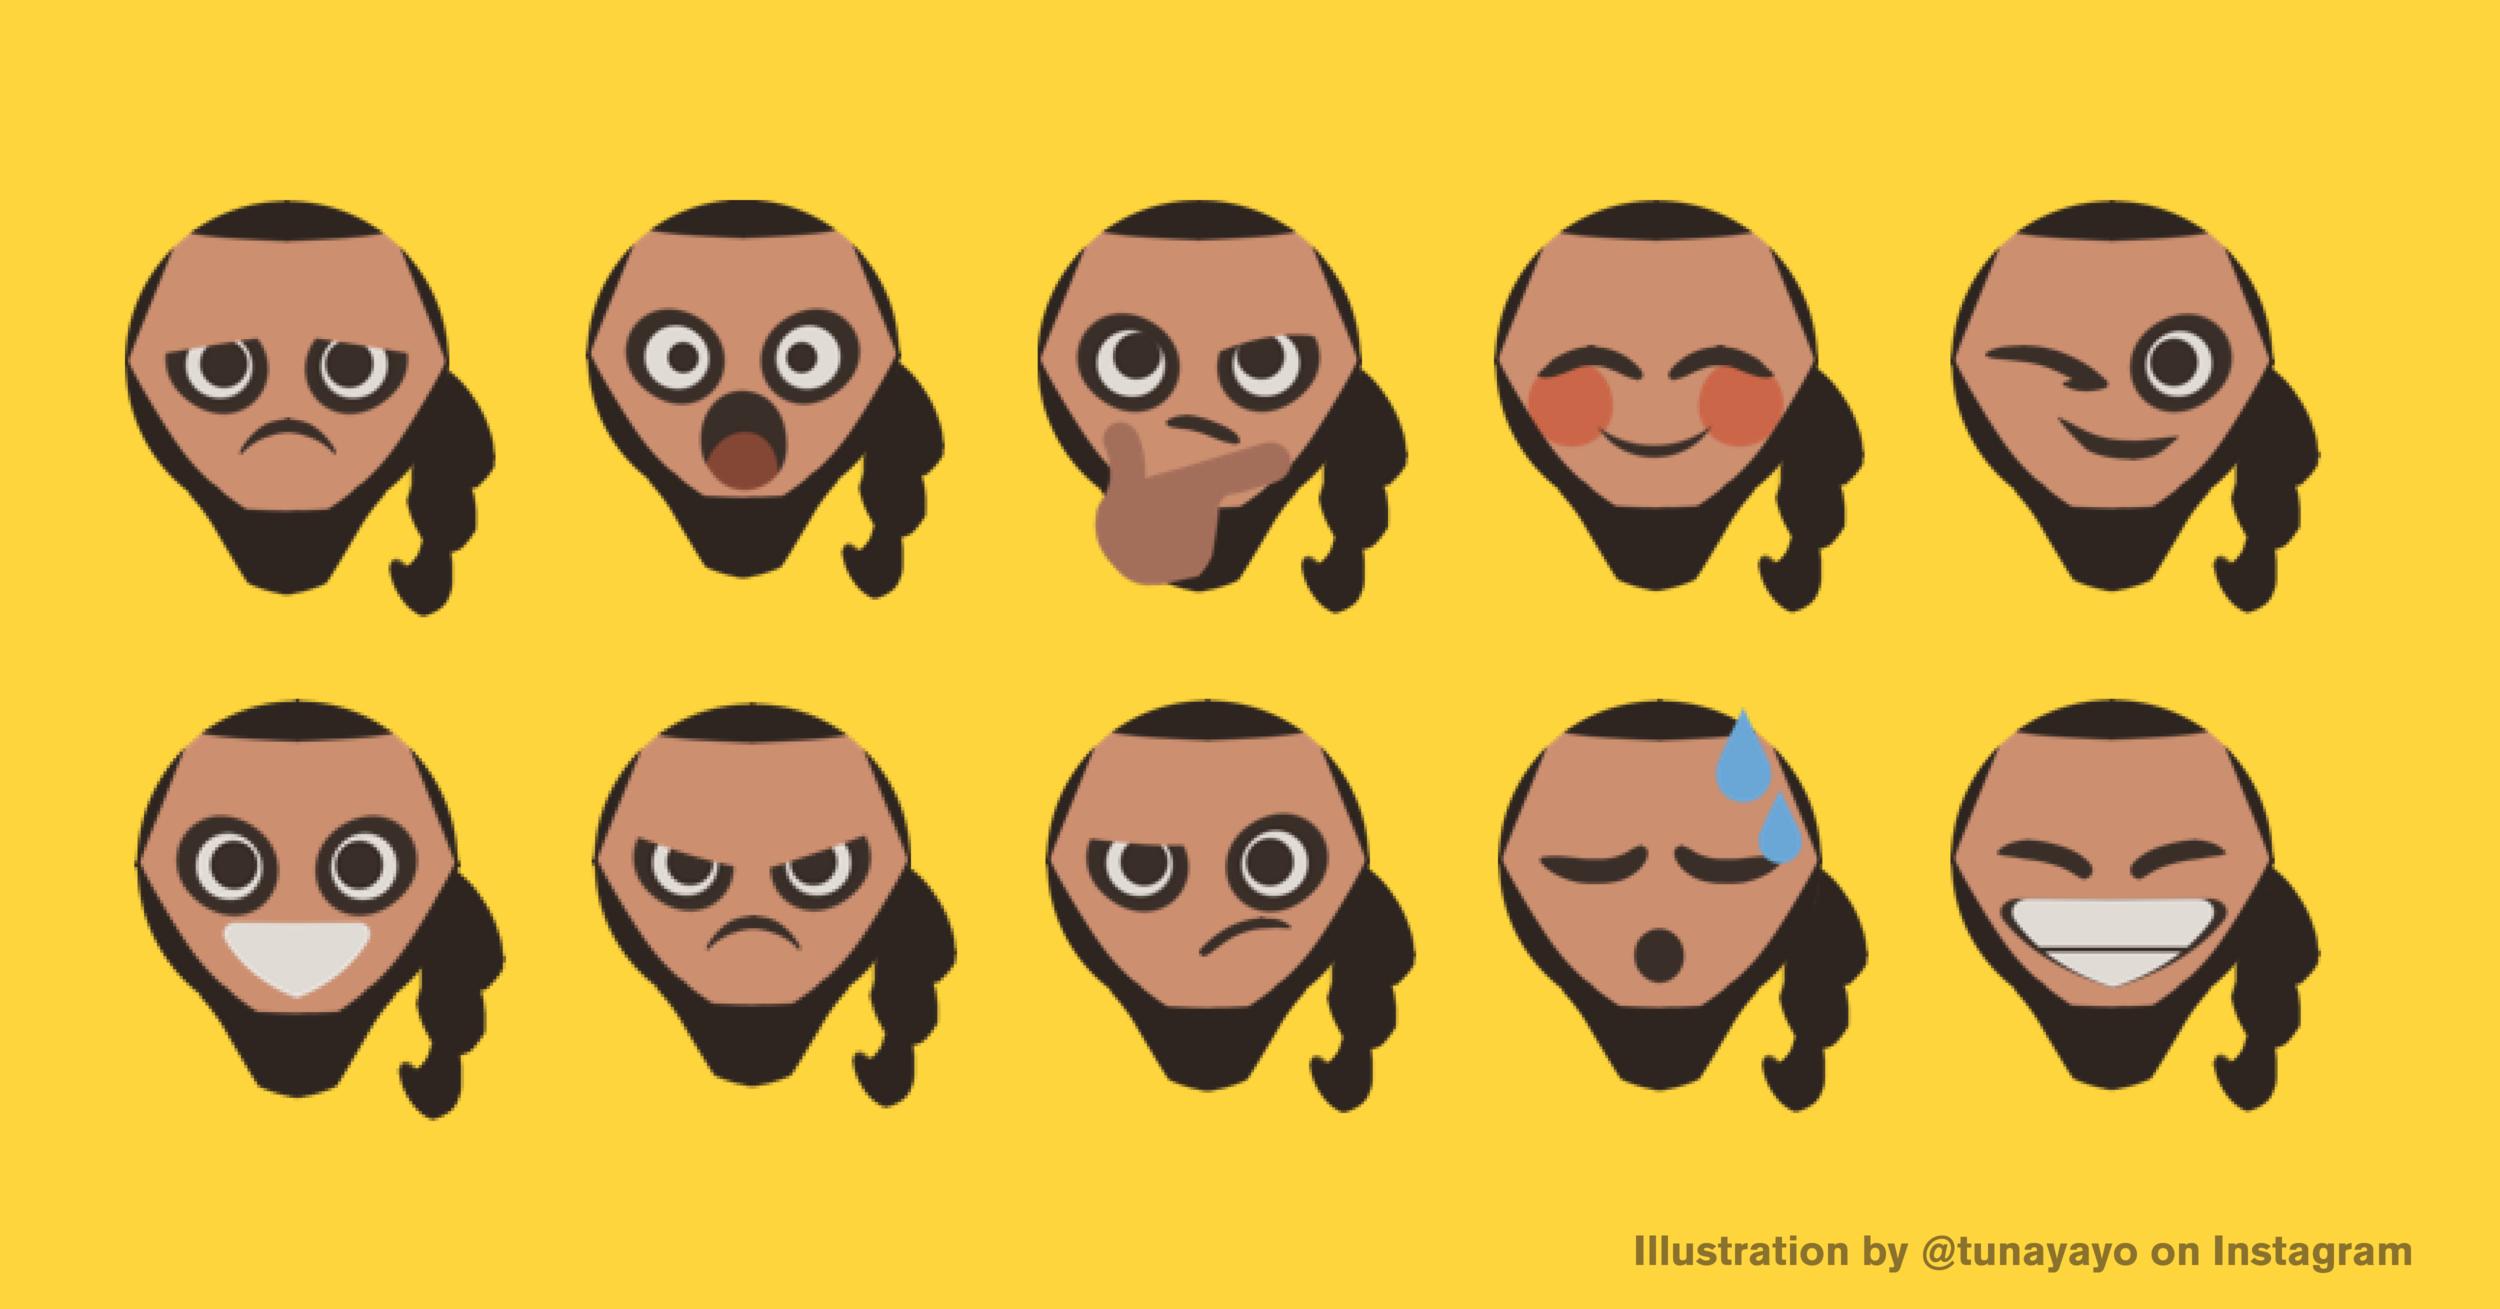 Dothraki emoji by  @tunayayo